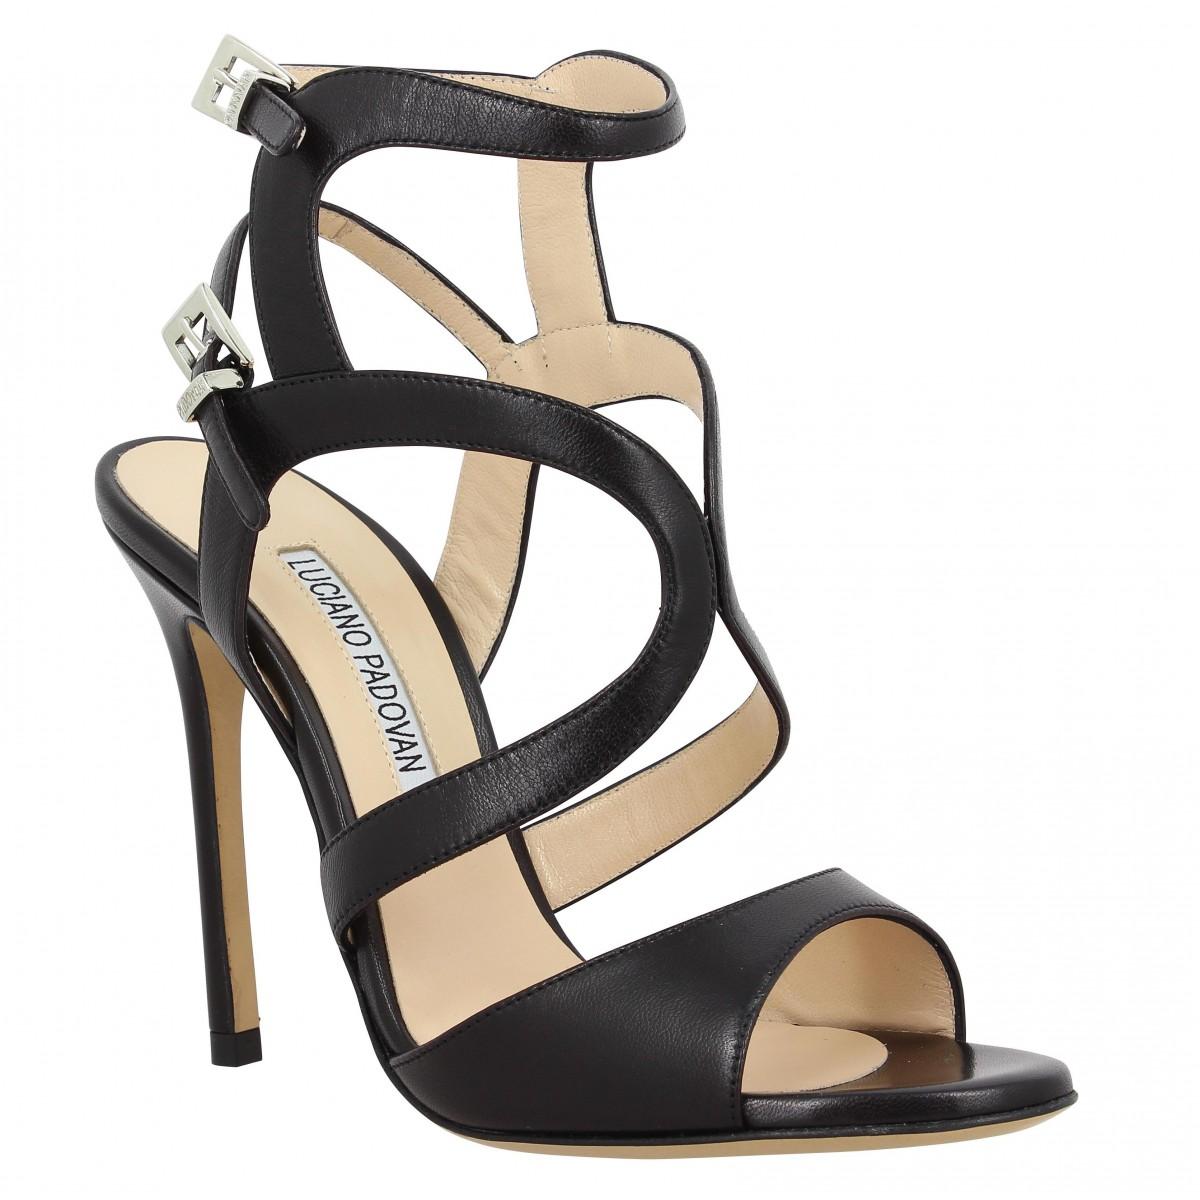 Sandales talons LUCIANO PADOVAN 119 cuir Femme Noir